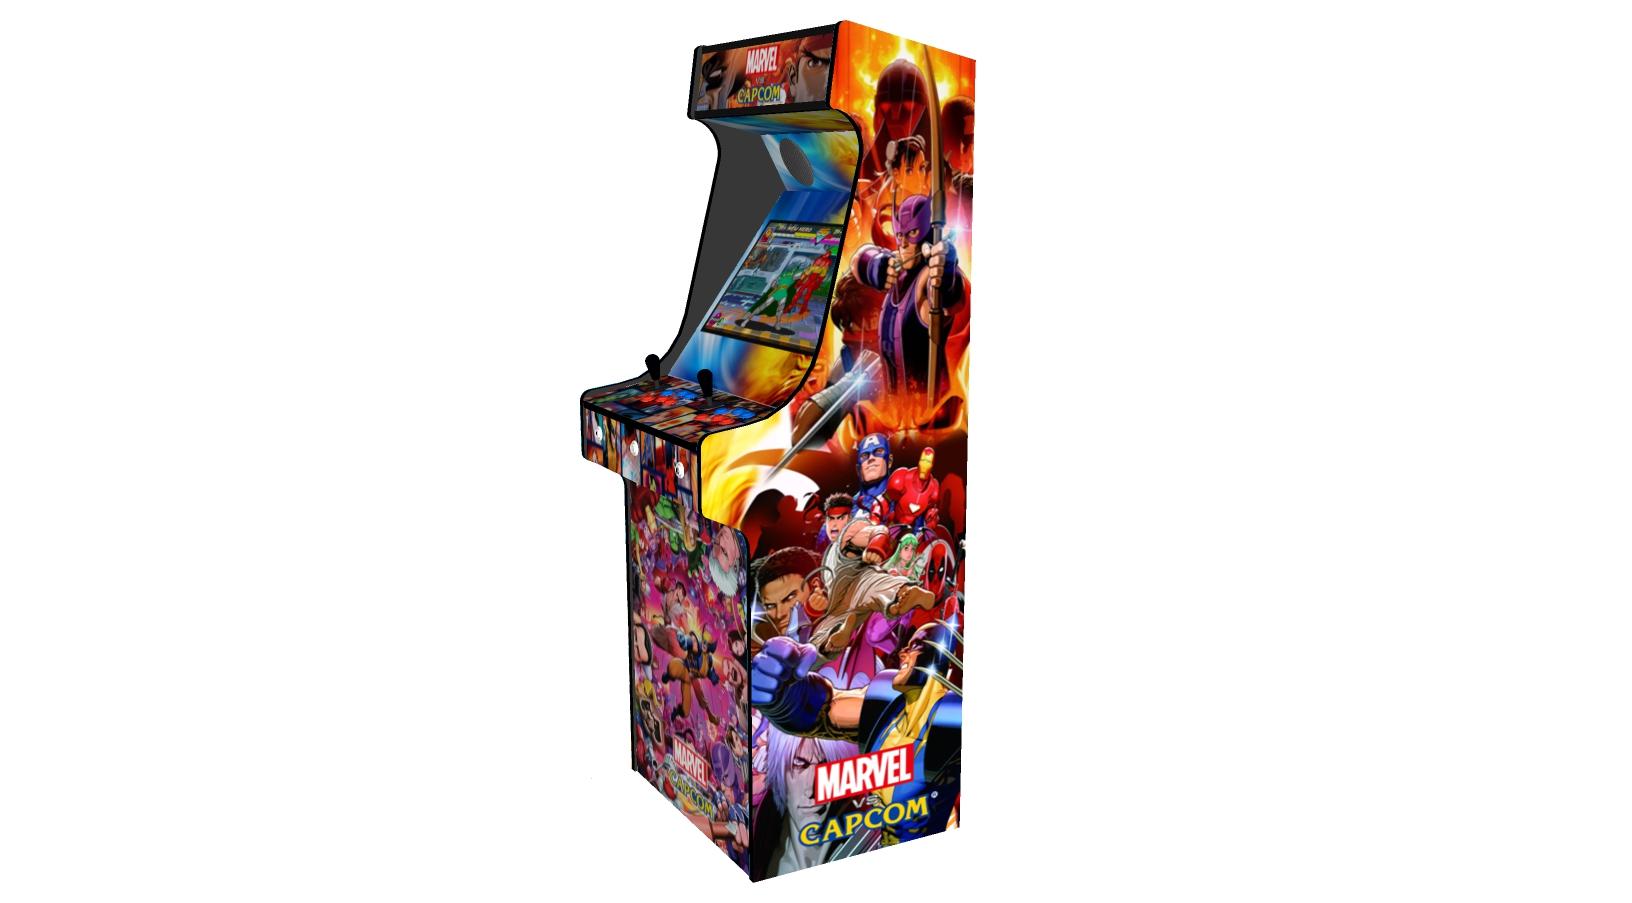 Classic Upright Arcade Machine - Marvel vs Capcom Theme - Right